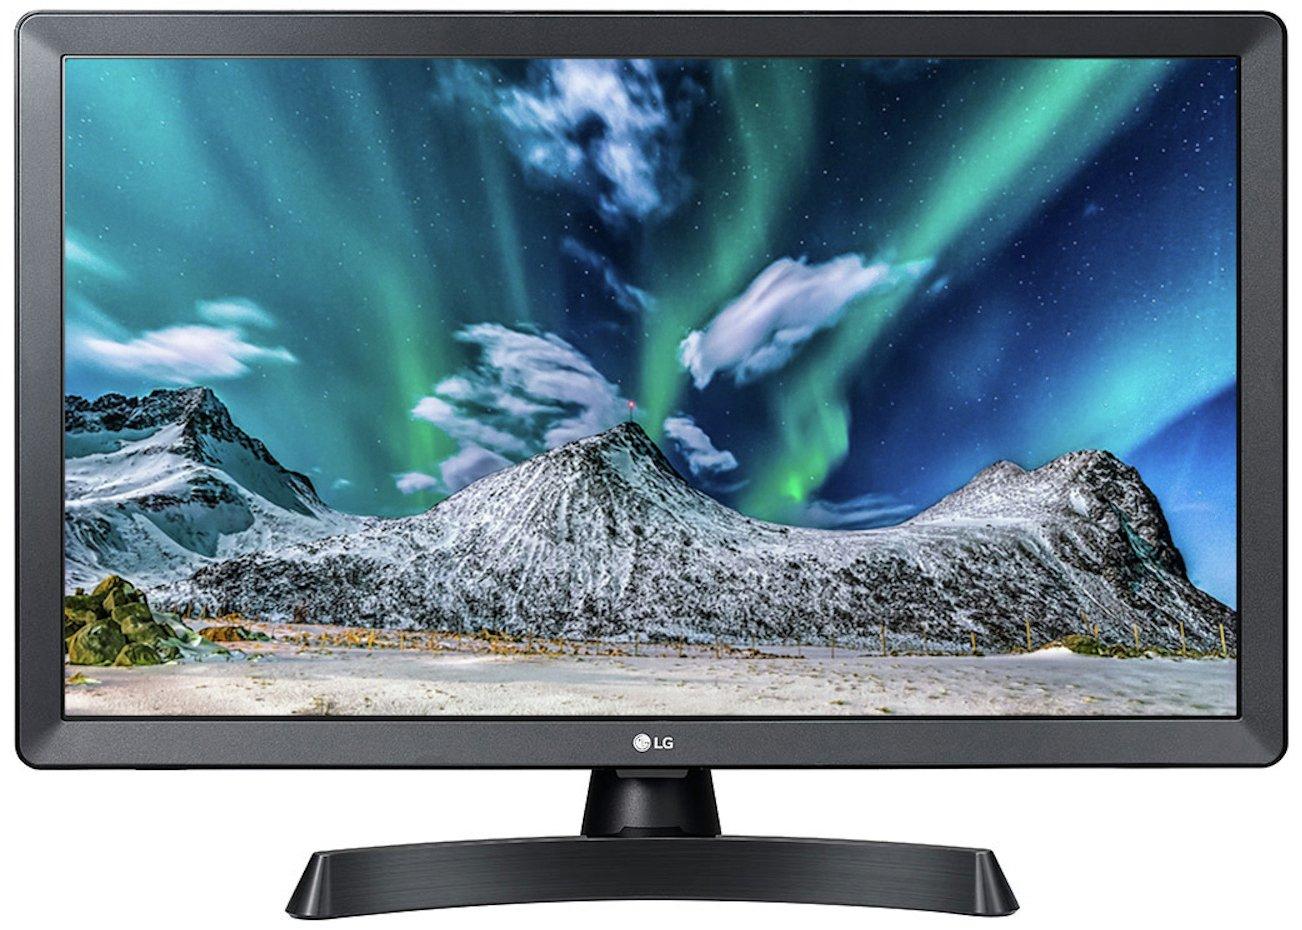 LG 28 Inch 28TL510V-PZ HD Ready LED TV